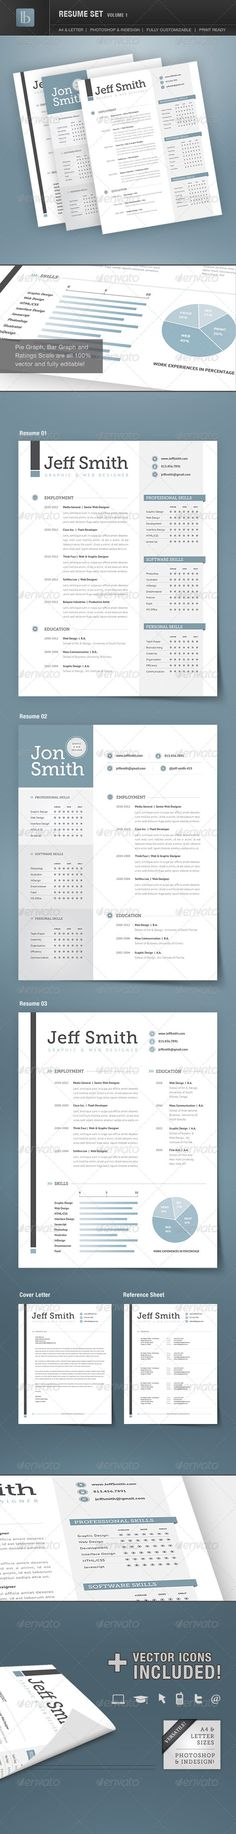 Resume Set | Volume 1 - GraphicRiver Item for Sale